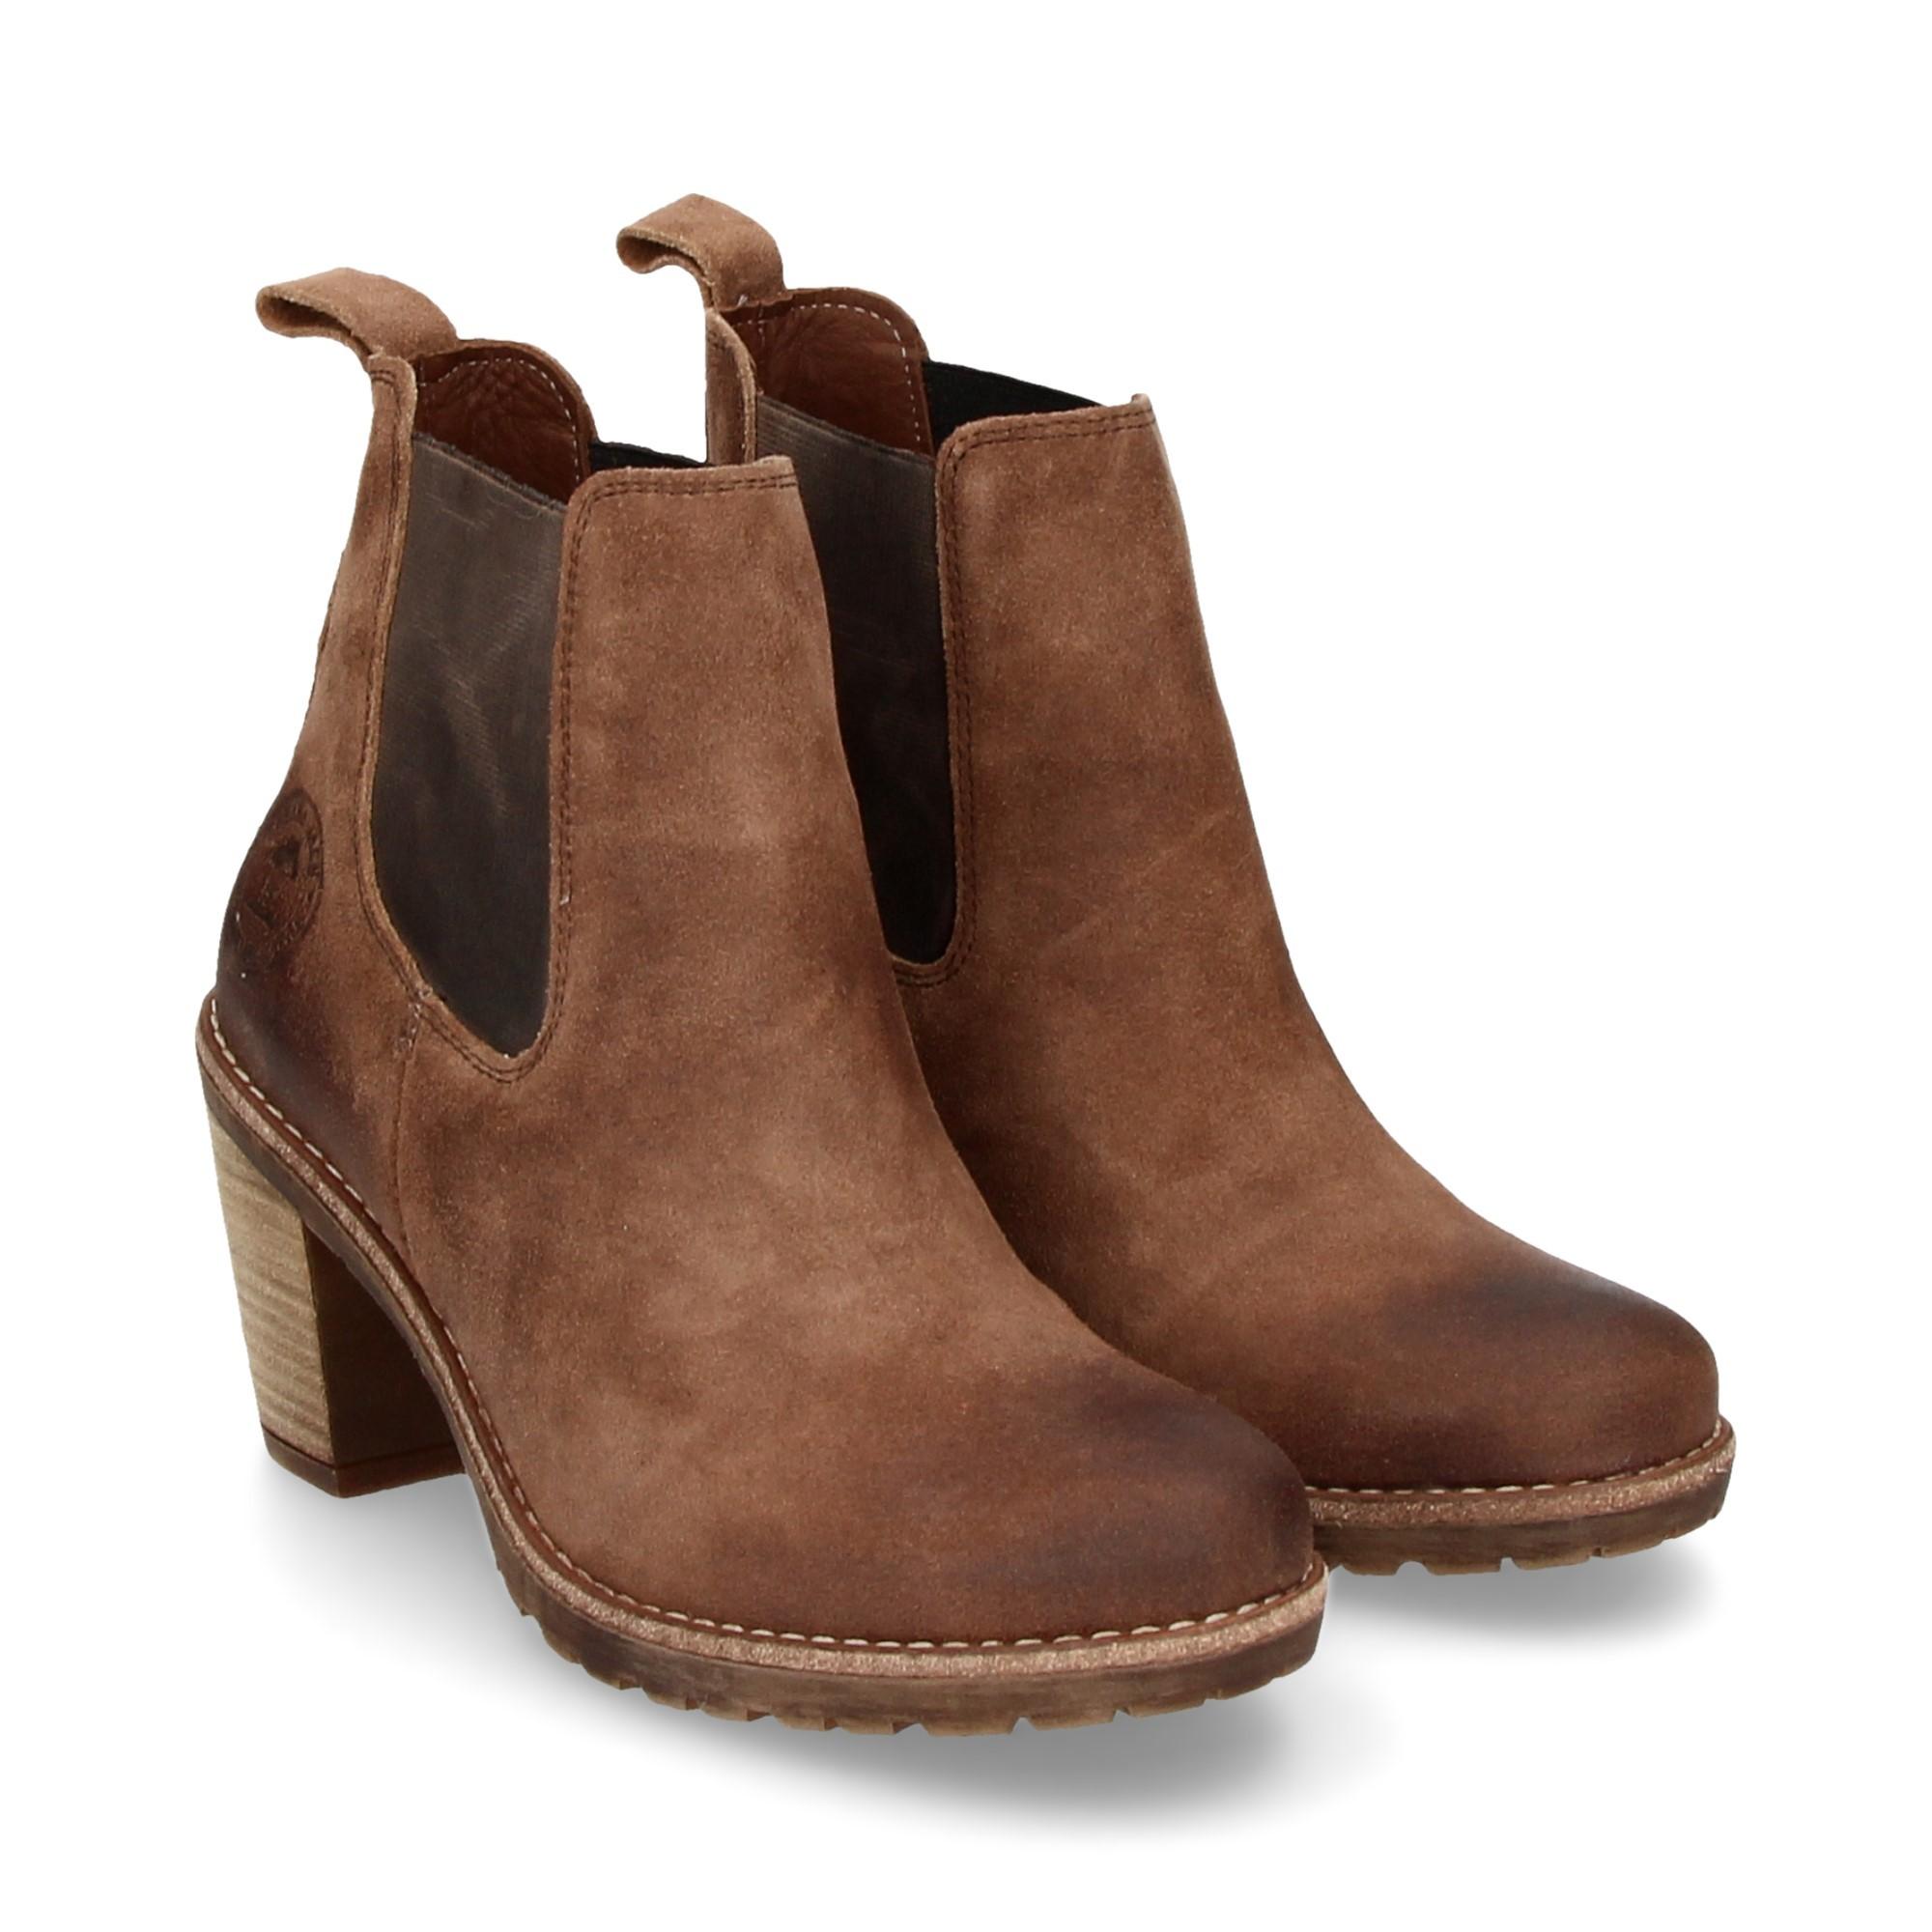 PANAMA JACK Women s Heeled ankle boots AVIGNON B2 TAUPE a2b8eeaec2